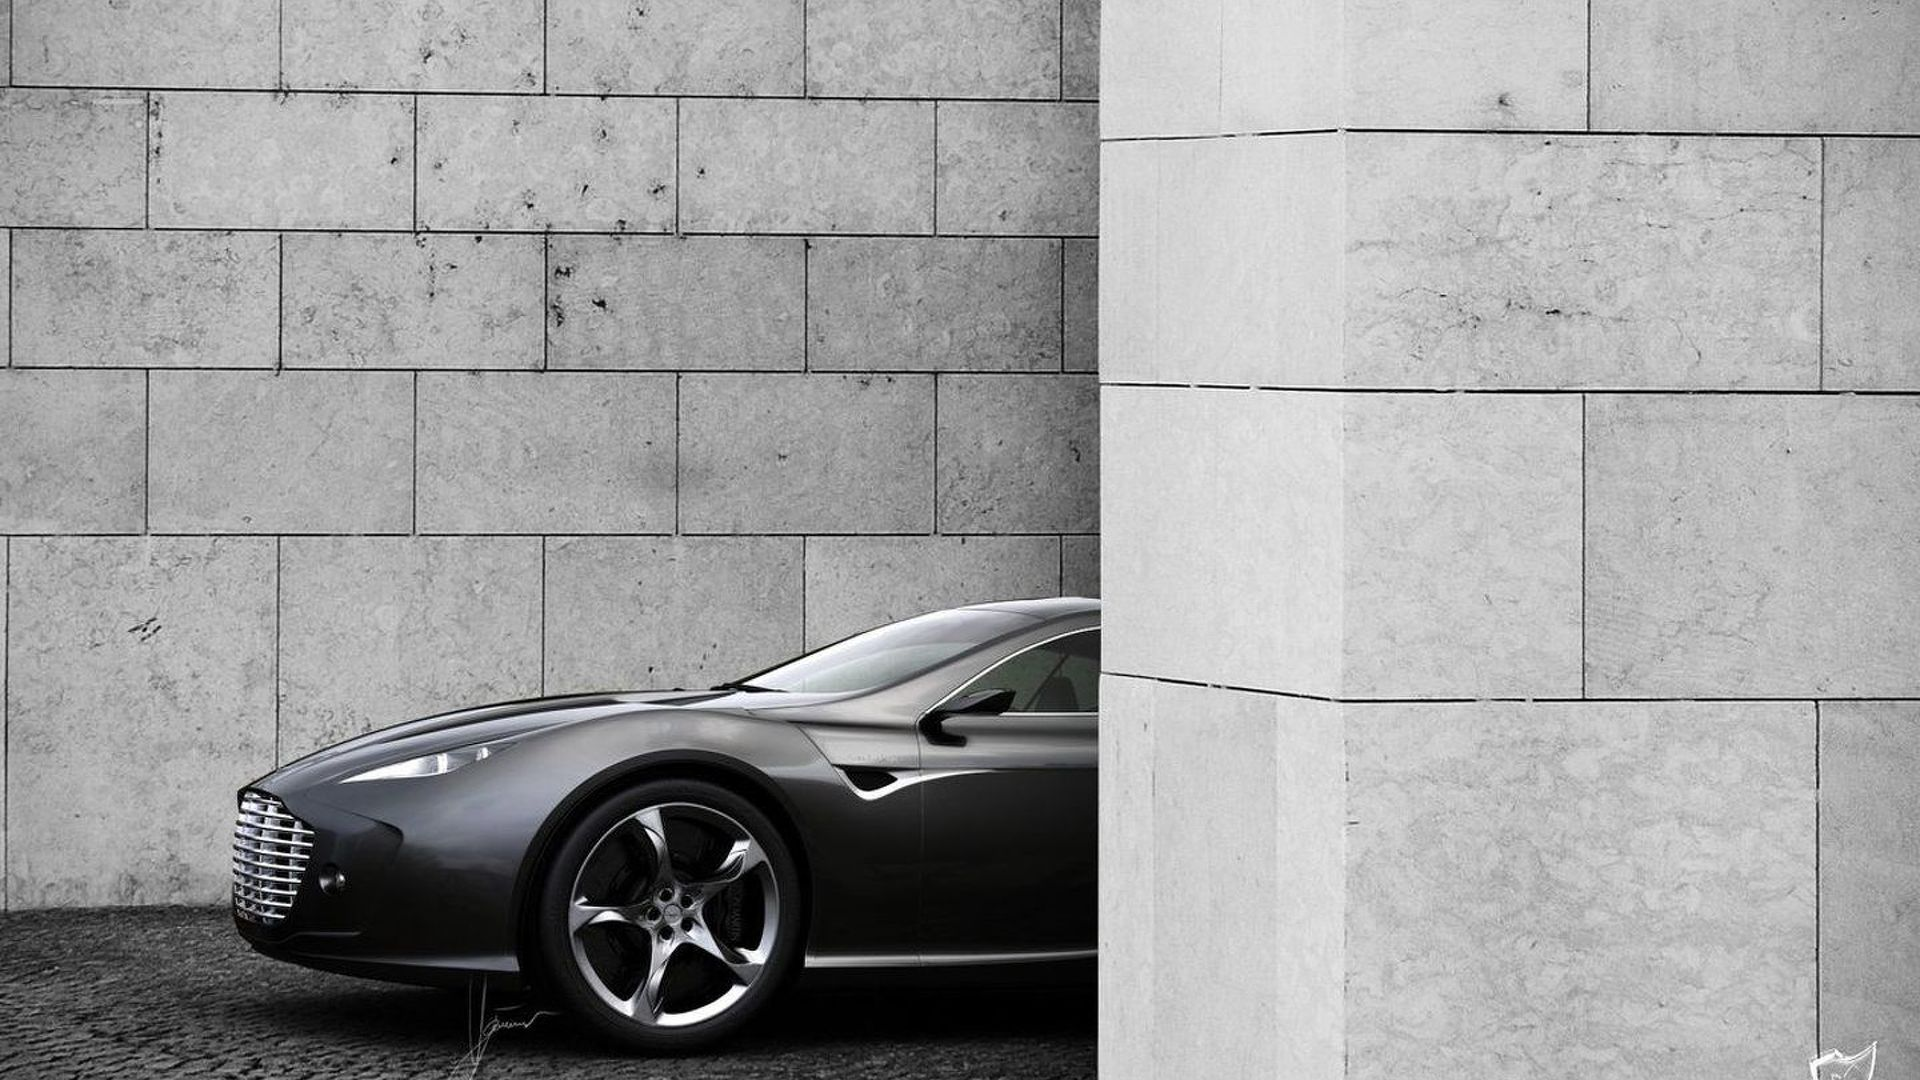 Aston Martin Gauntlet Concept Design Proposal by Ugur Sahin [Video]